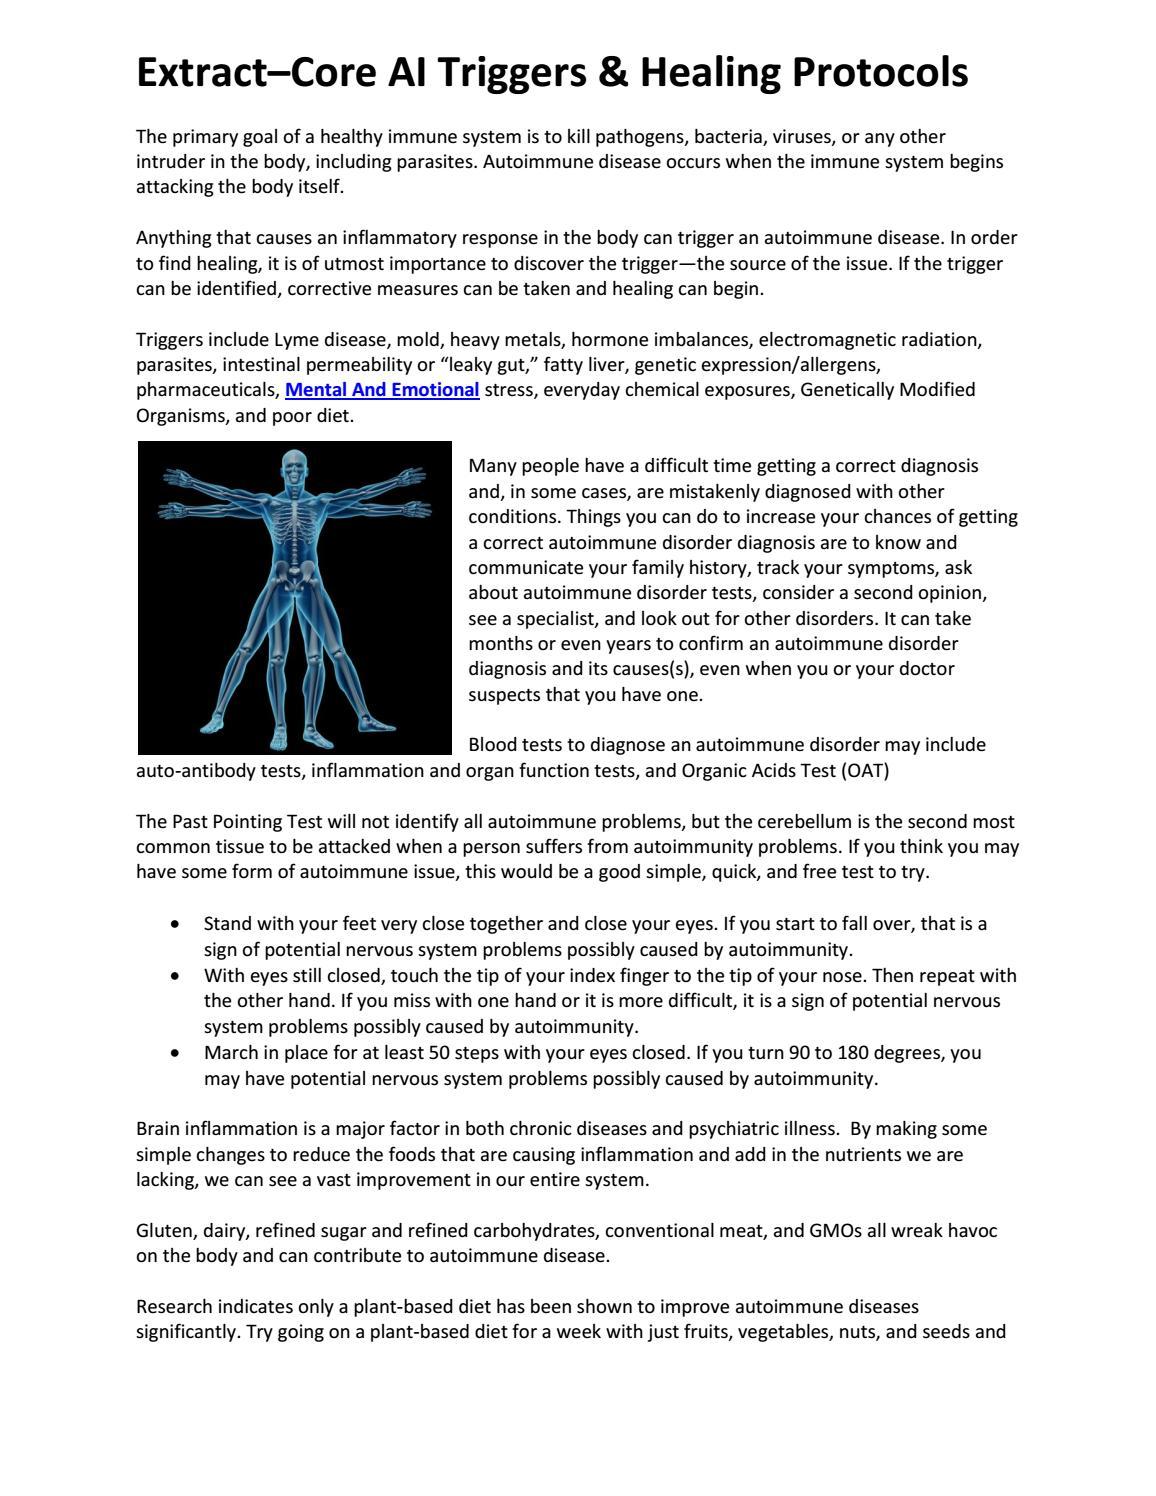 Extract–Core AI Triggers & Healing Protocols by Jonathan